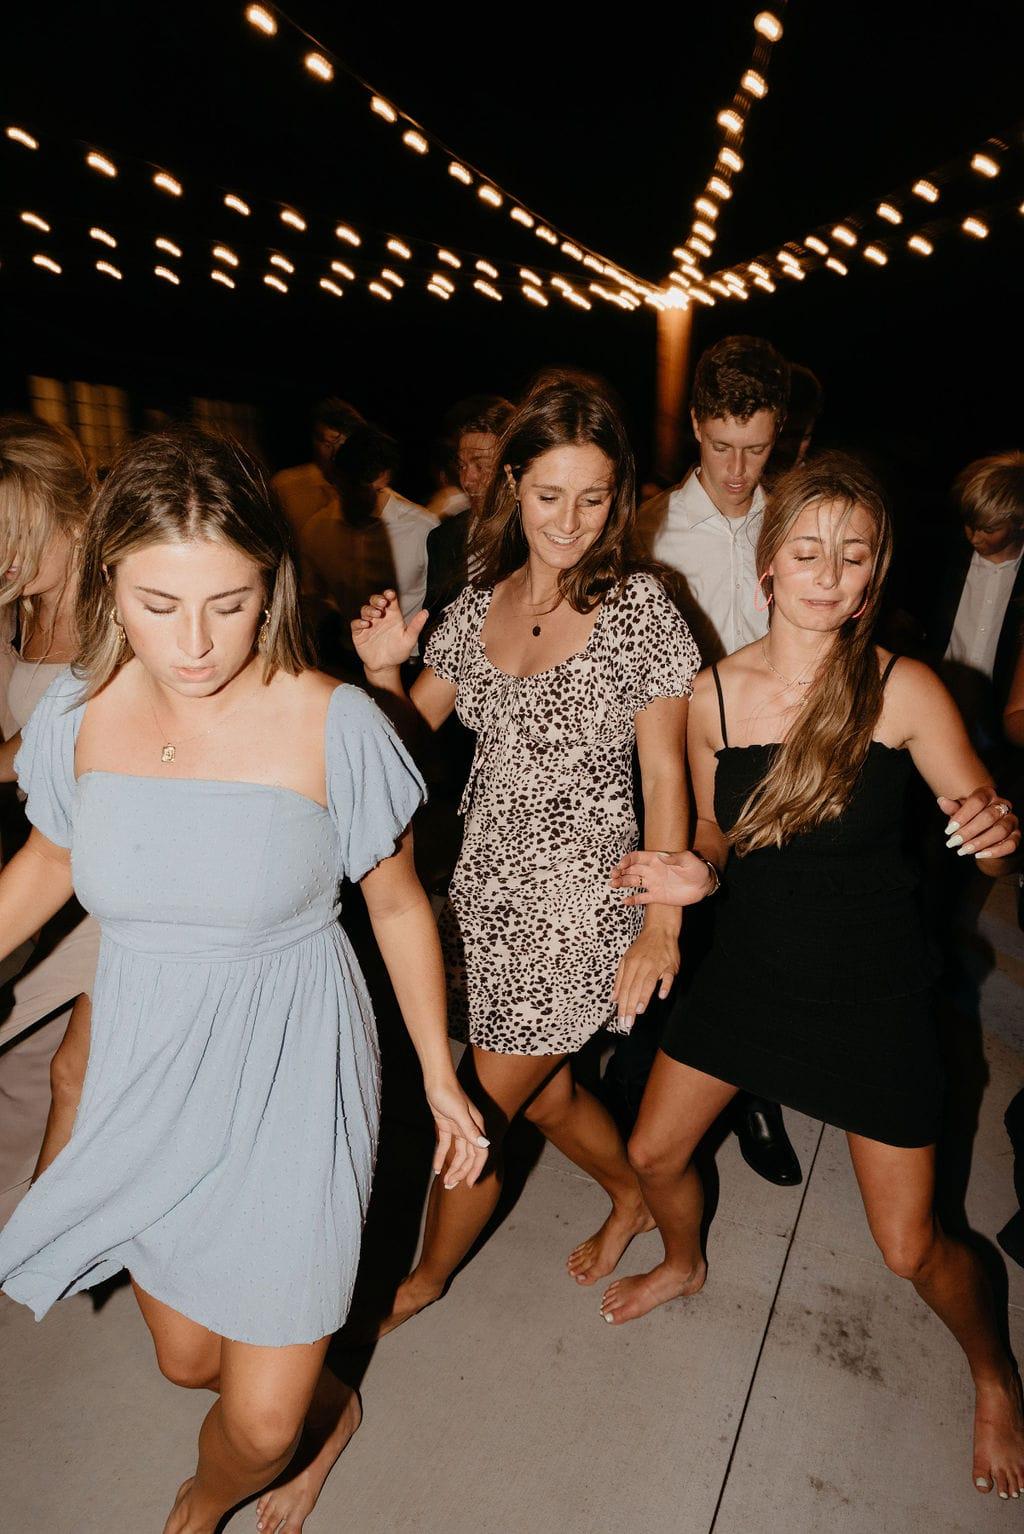 Fun nighttime dance reception photos